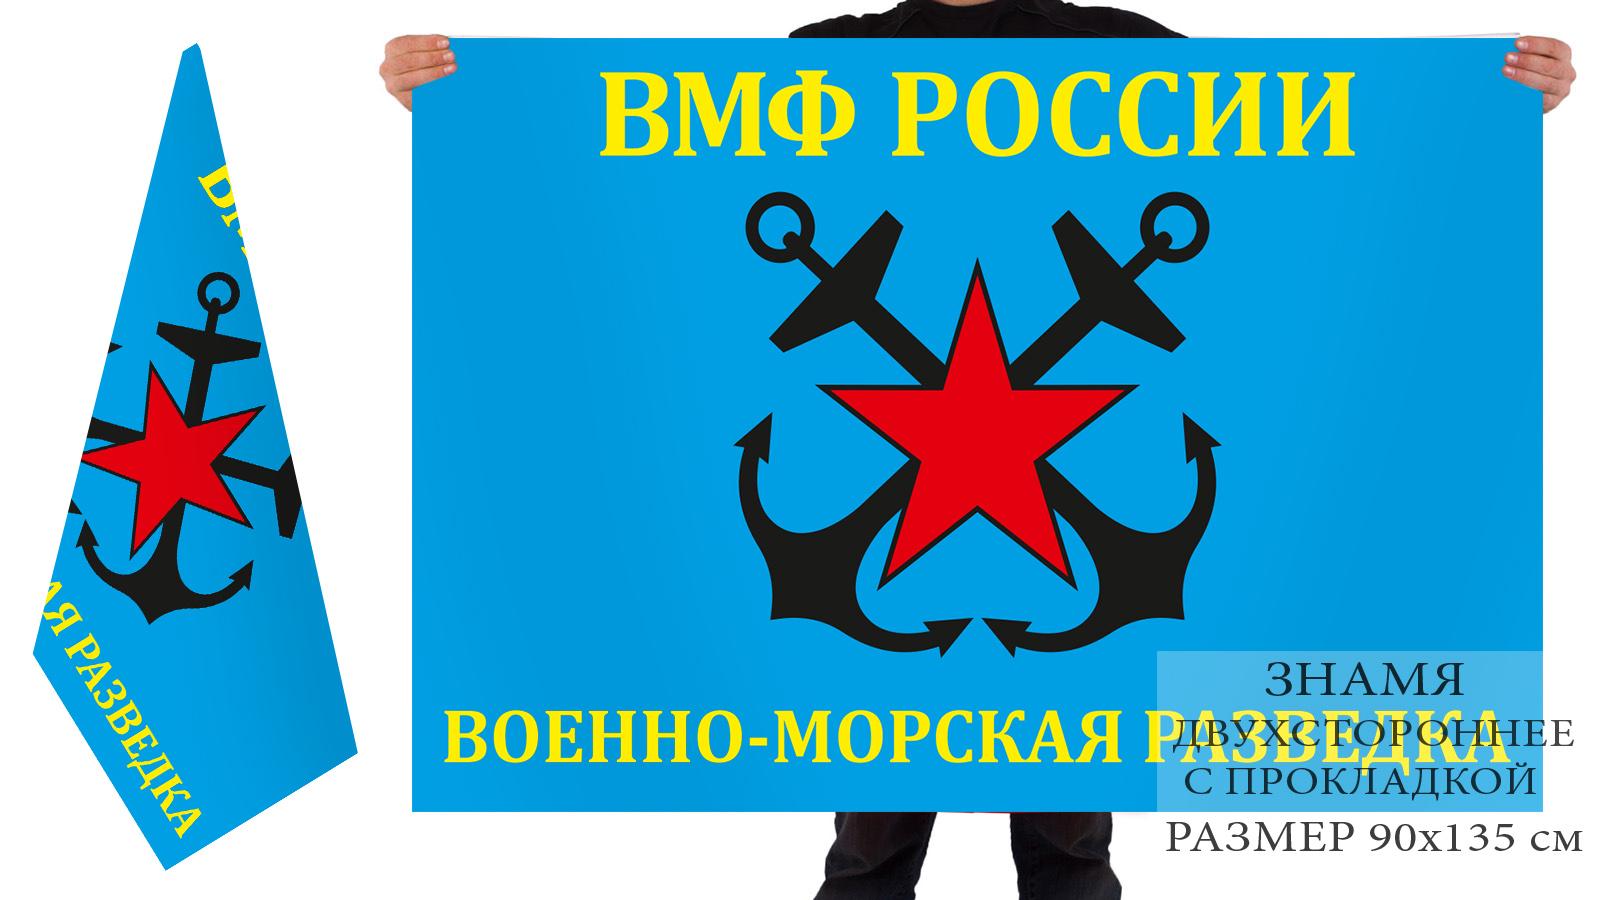 Двусторонний флаг Военно-морской разведки ВМФ России